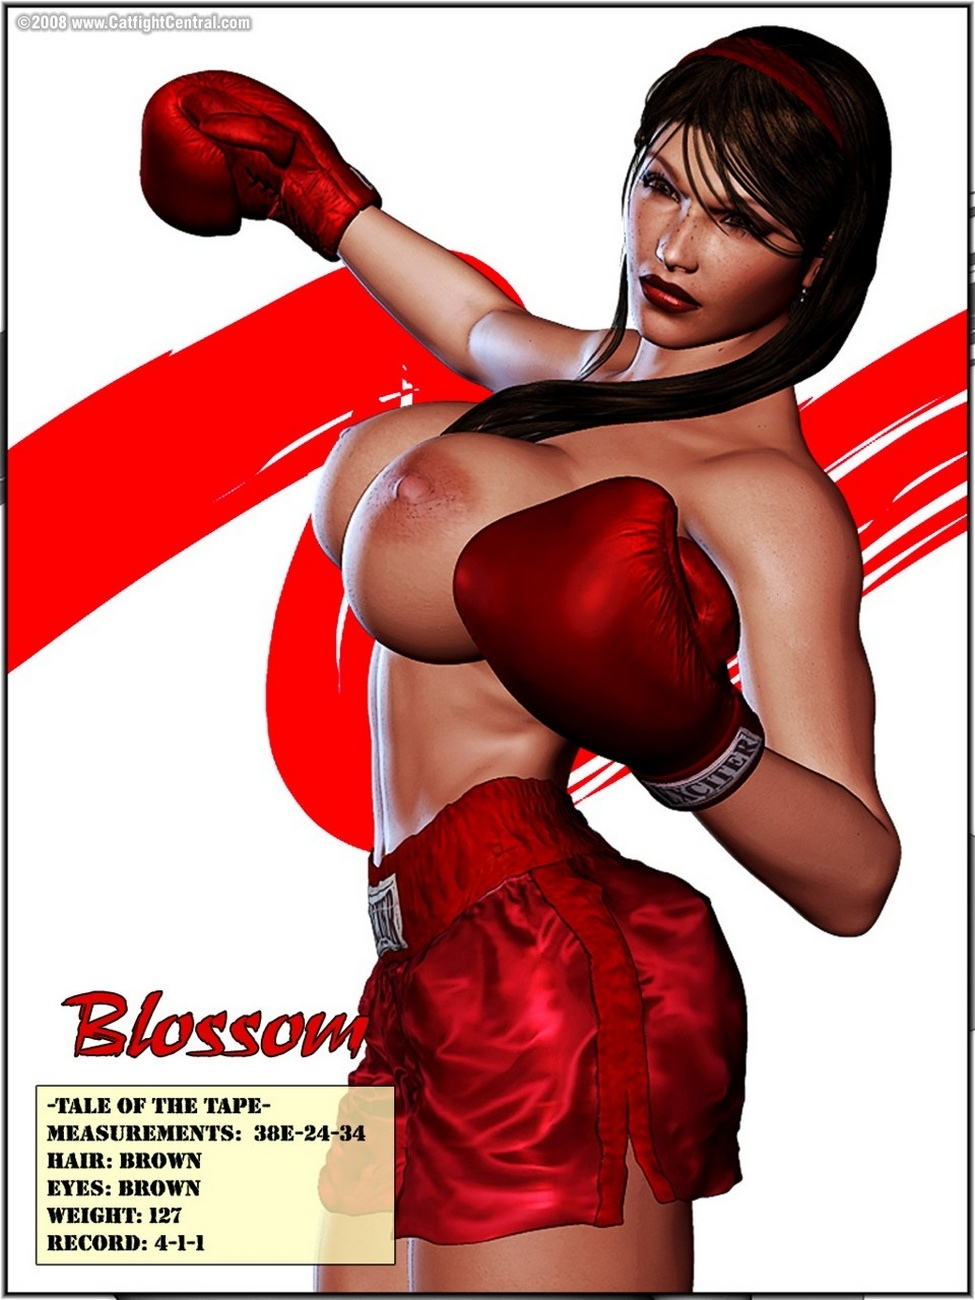 Foxy Boxing Porn - ... Foxy-Boxing-1-Blossom-Vs-Julie-Round-1 3 ...